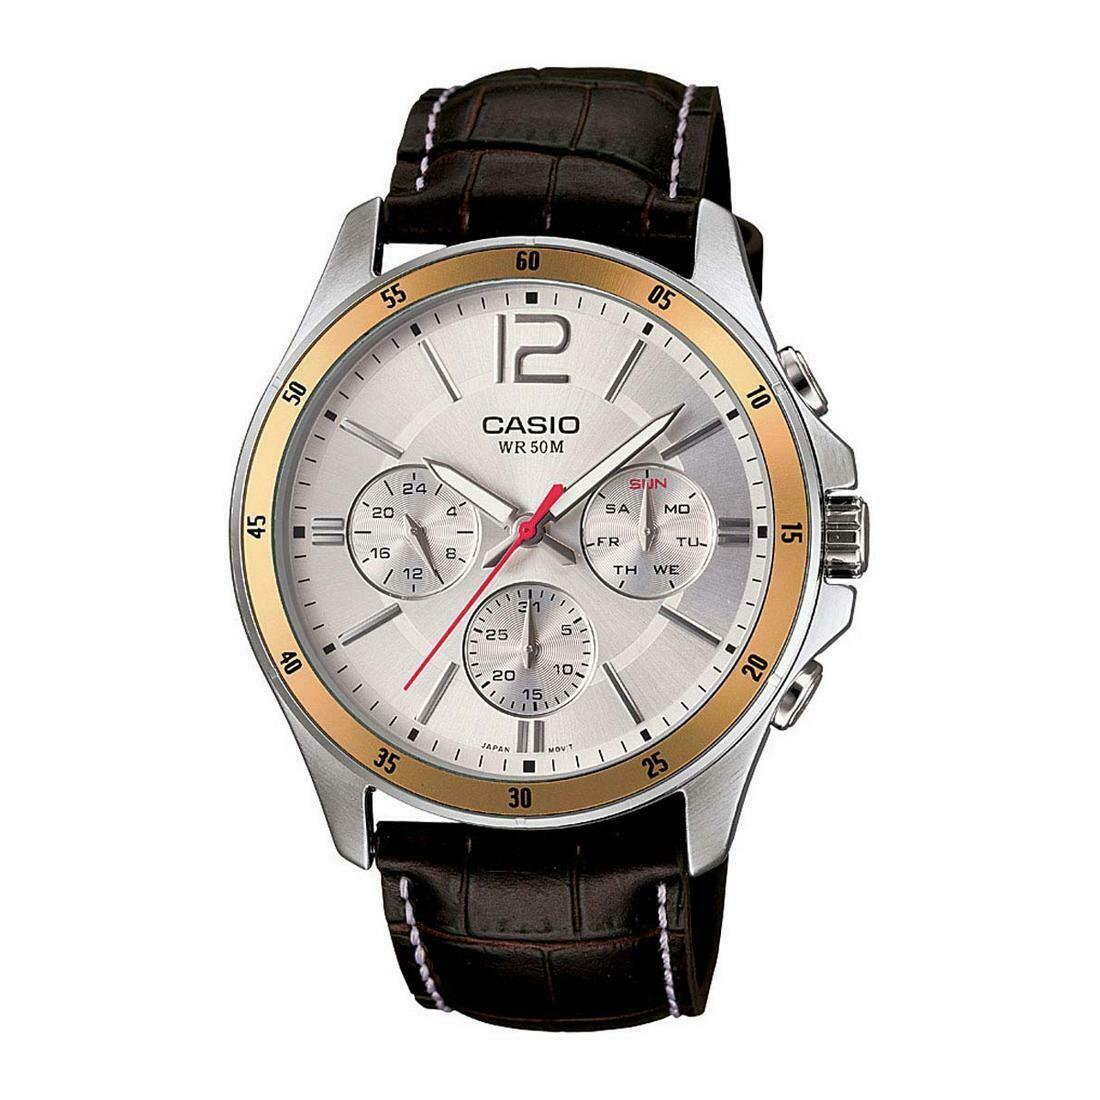 Casio Enticer MTP-1374L-7AVDF Analog Wrist Watch For Men - Brown